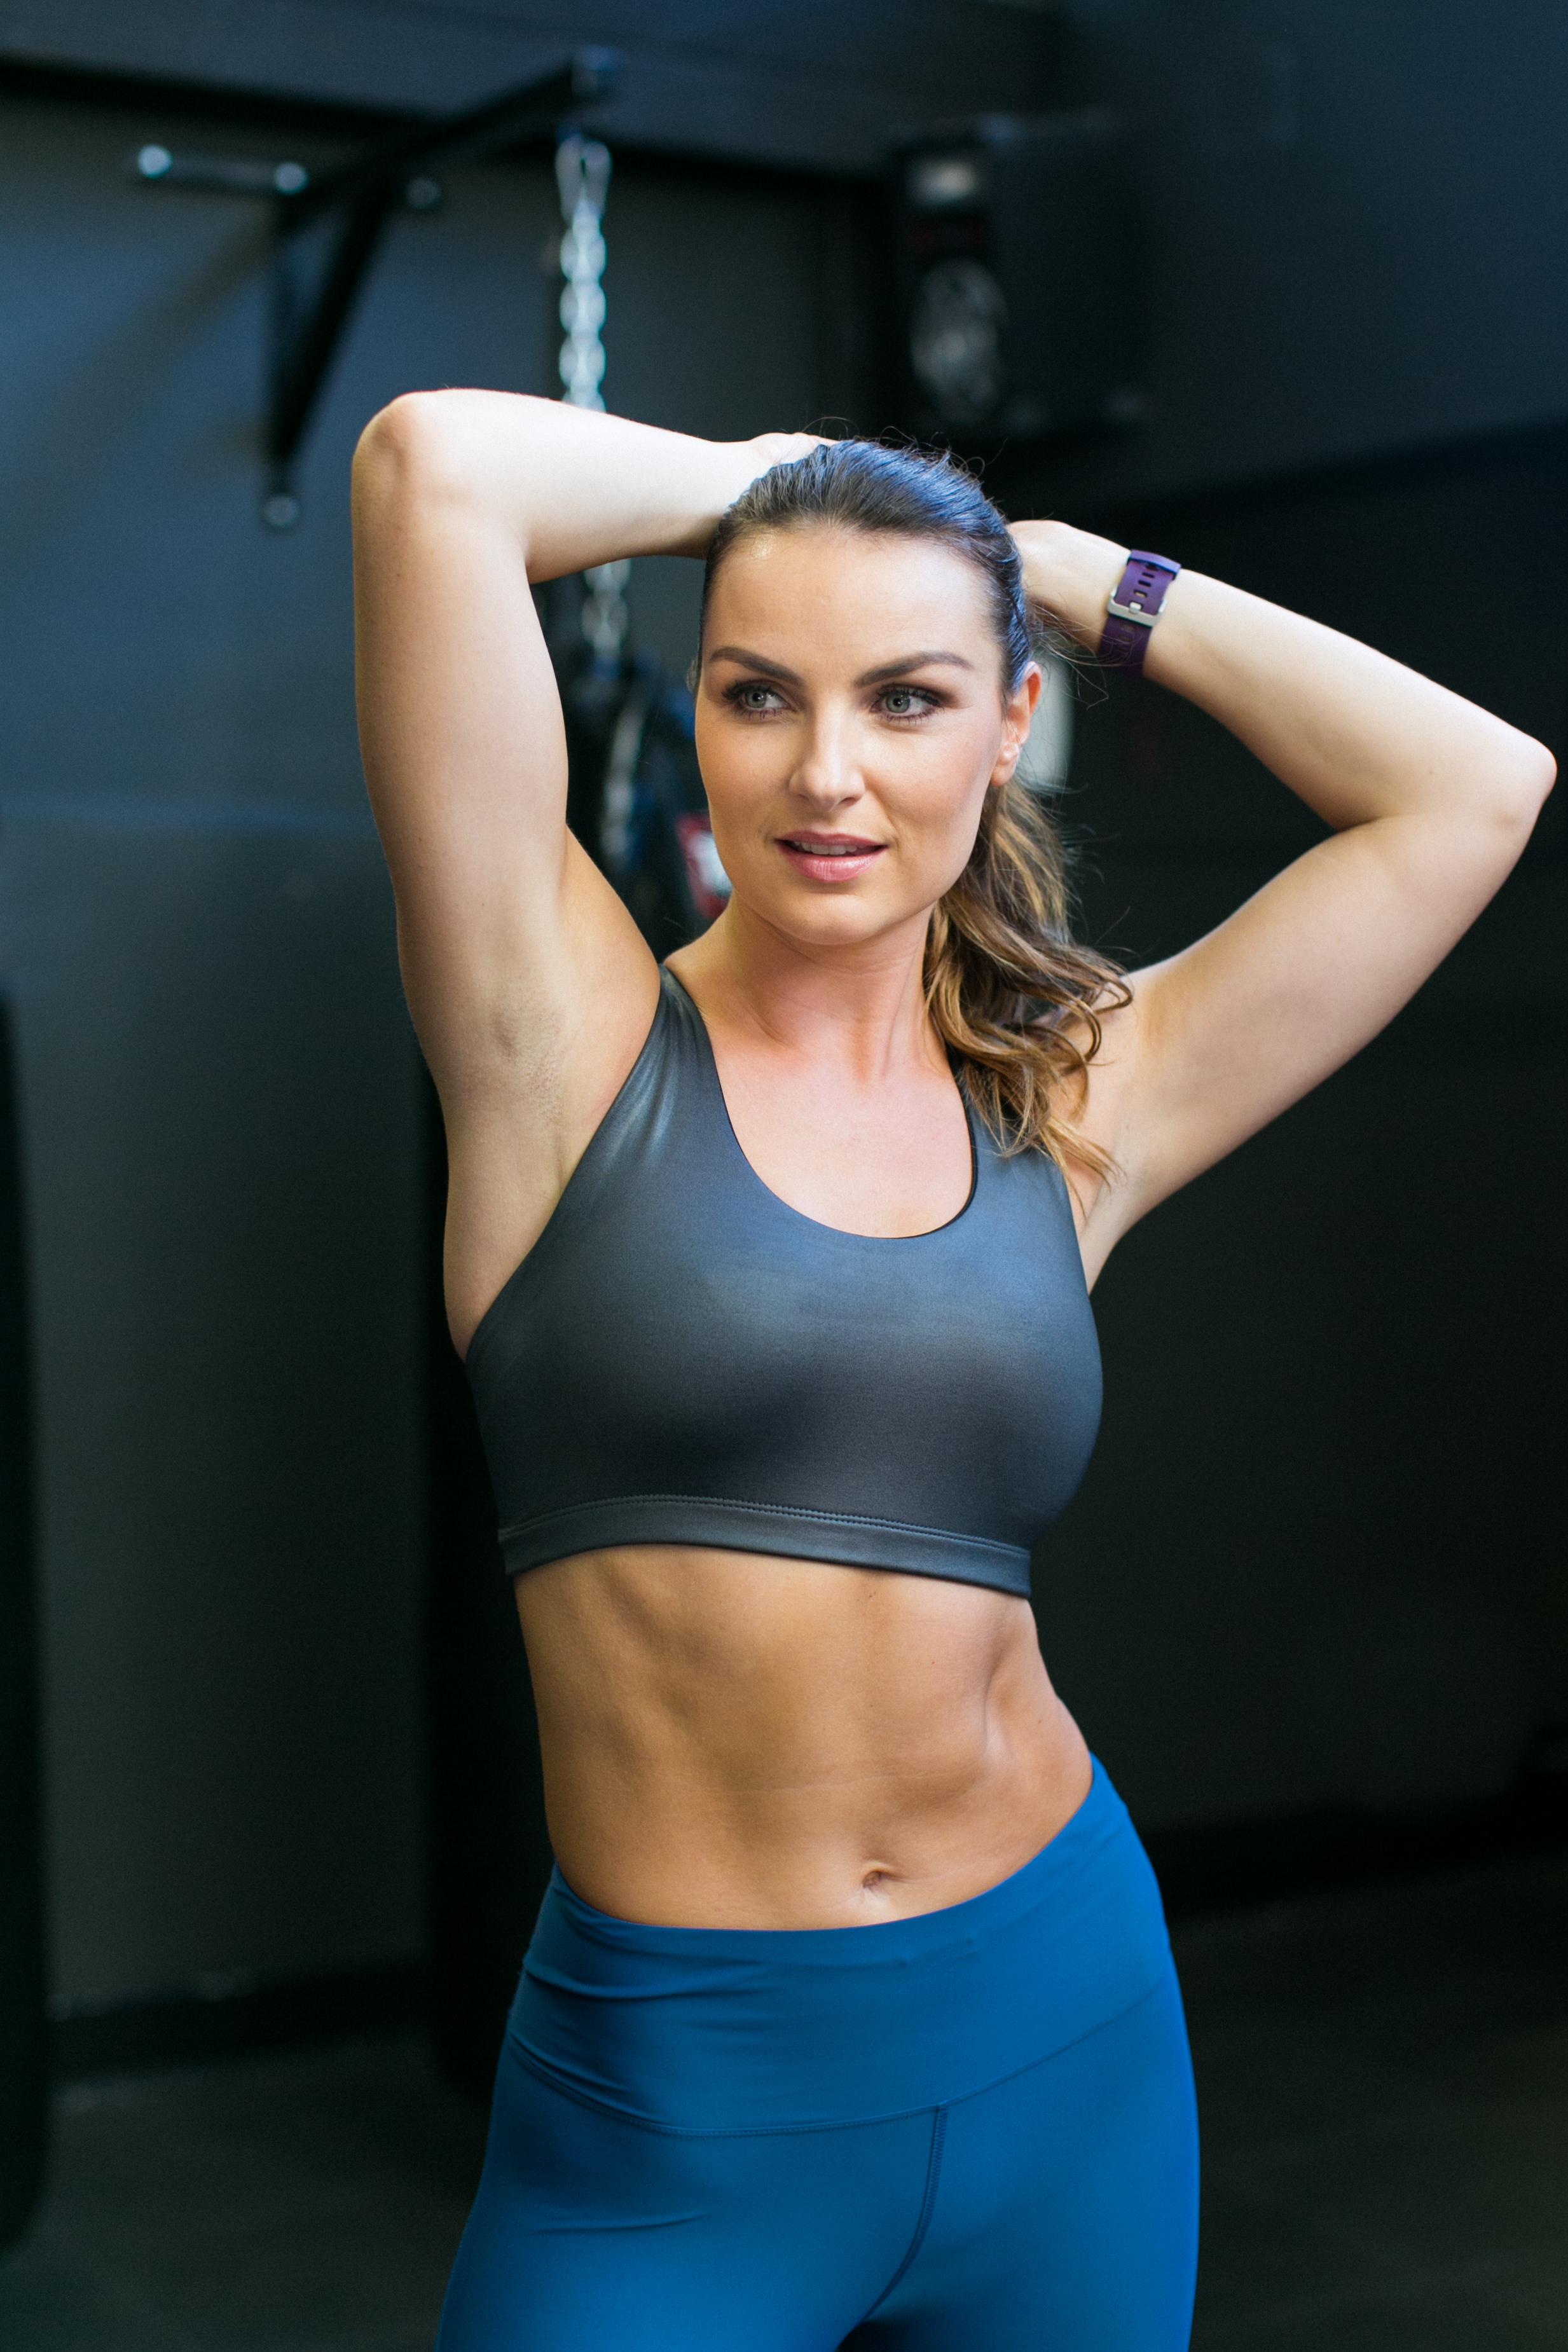 Laura-Bodyzone-Anneli-Marinovich-Photography-12.jpg